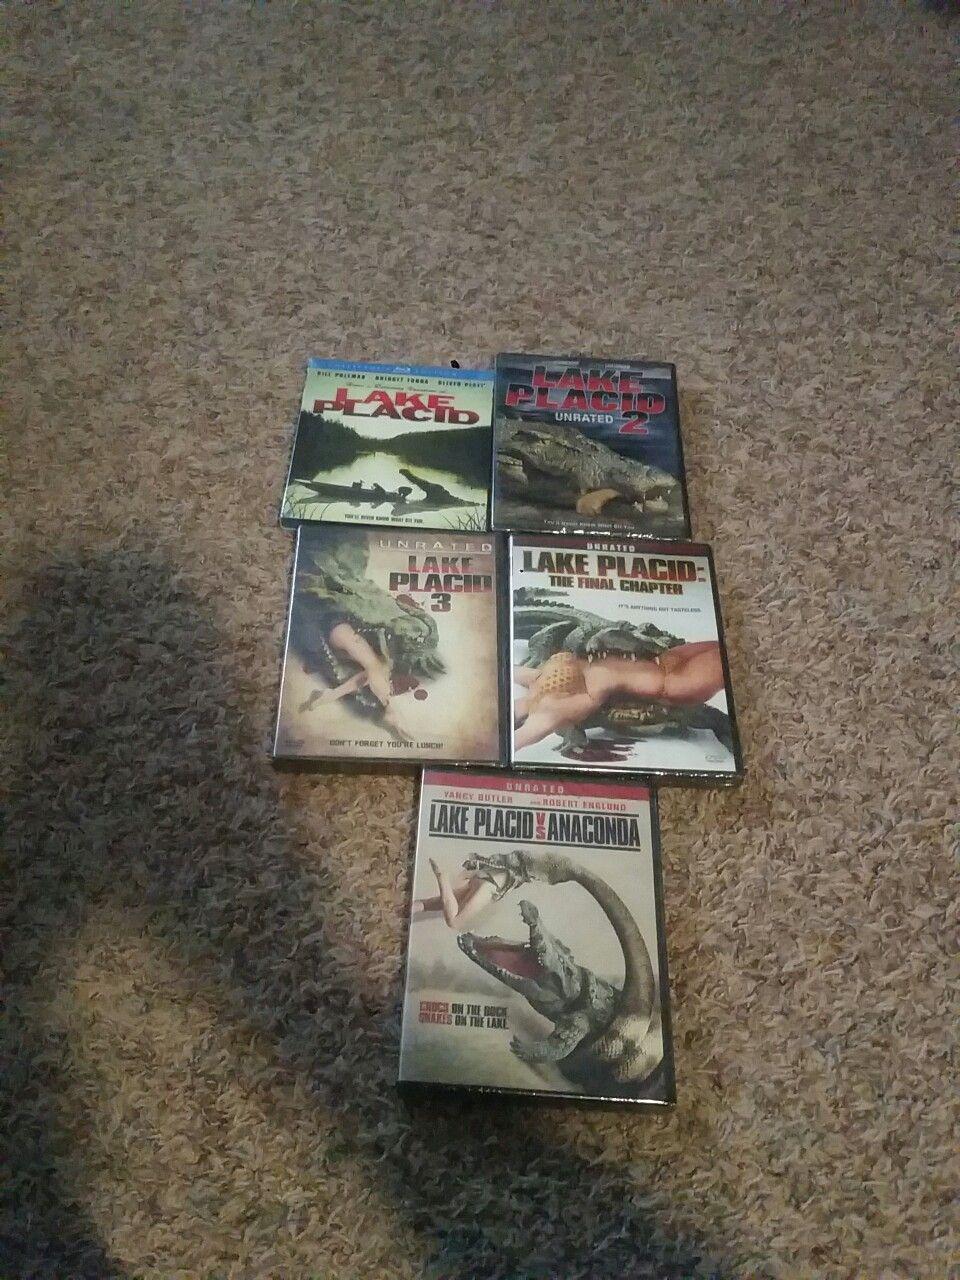 Anaconda Vs Lake Placid Full Movie got these in the mail last monday. lake placid 1, 2, 3, the